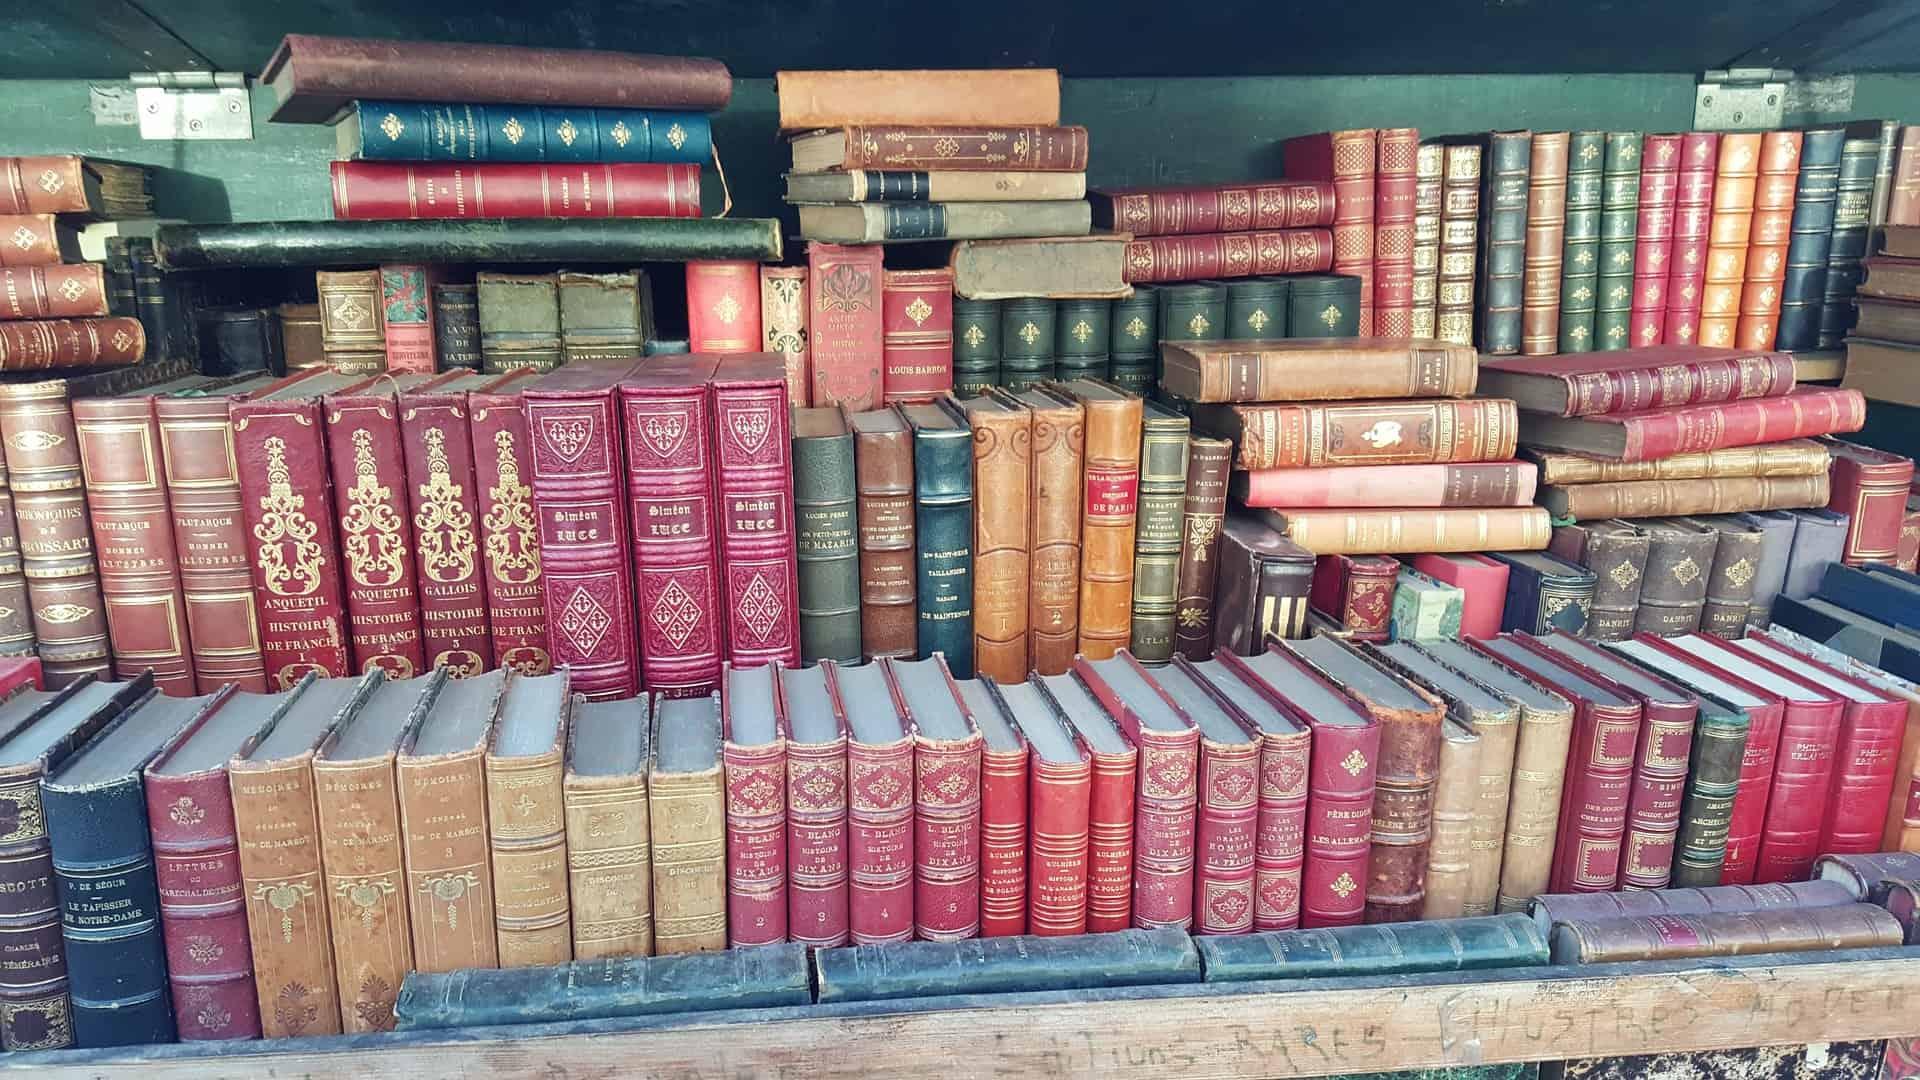 hidden gems Paris - visit the covered book market at Parc Georges Brasses